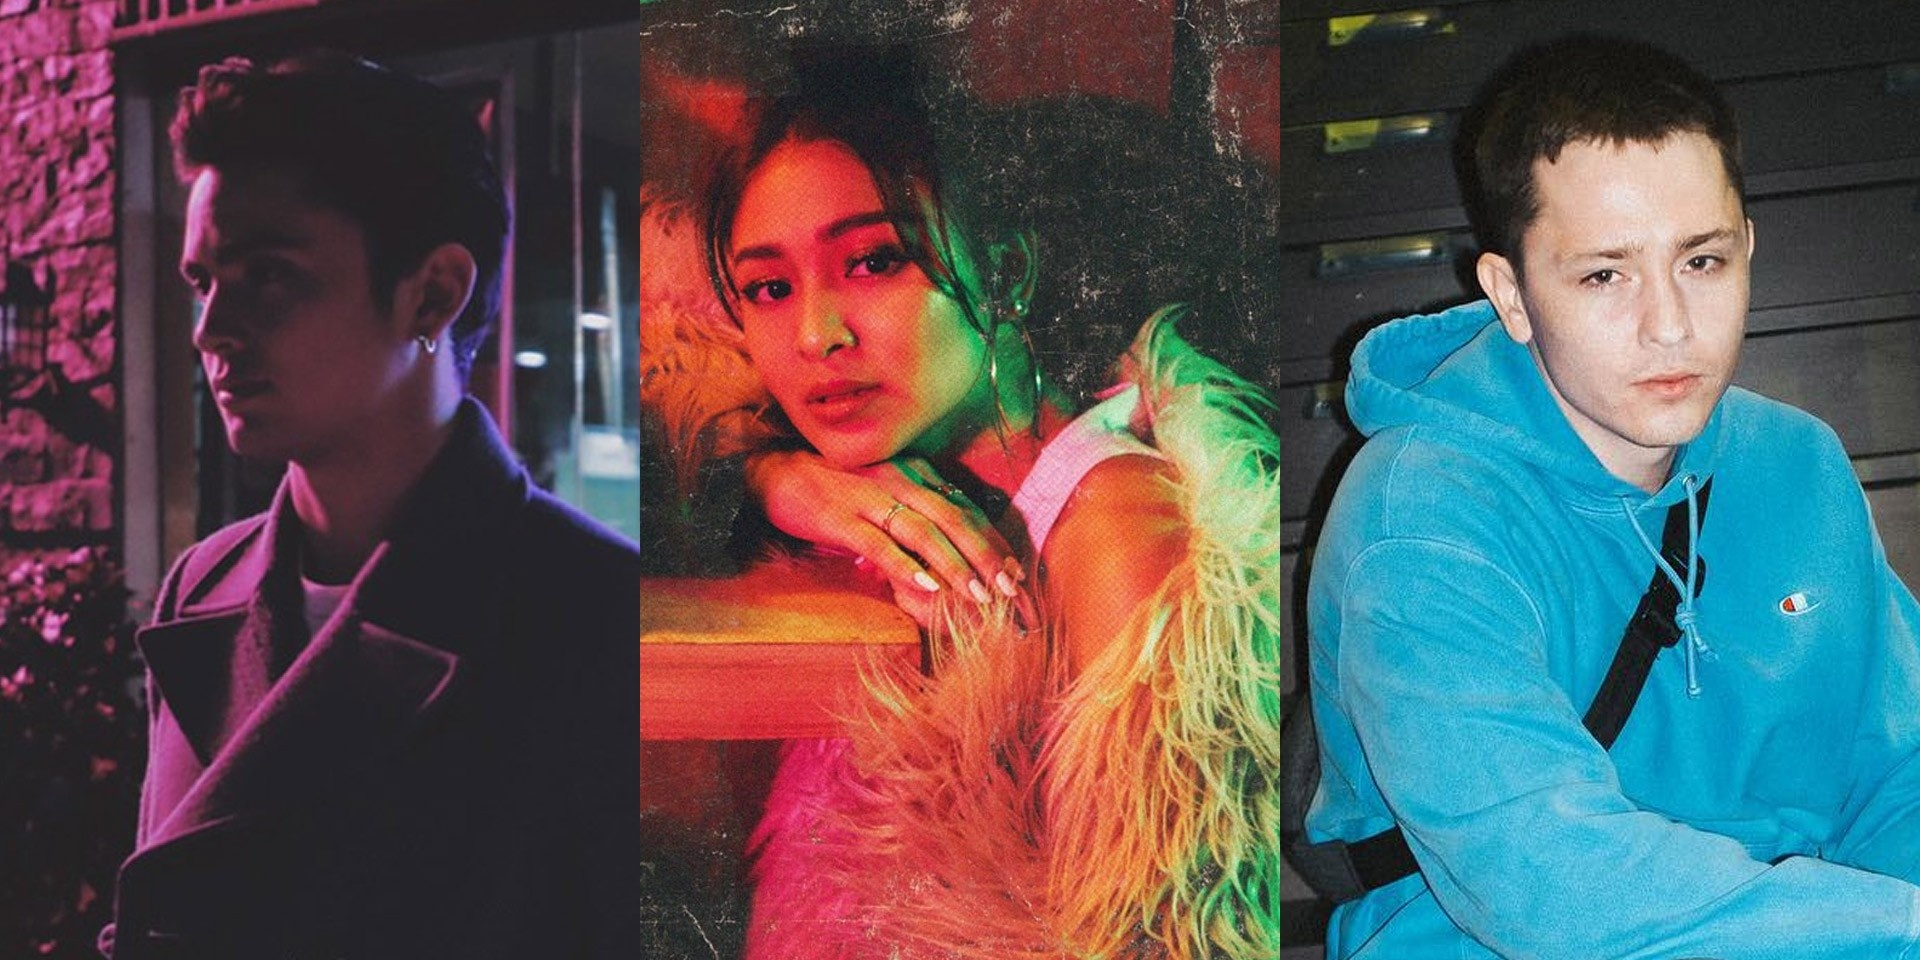 Careless Music Manila's James Reid, Nadine Lustre, KINGwAw, and more to open Khalid's Manila concert